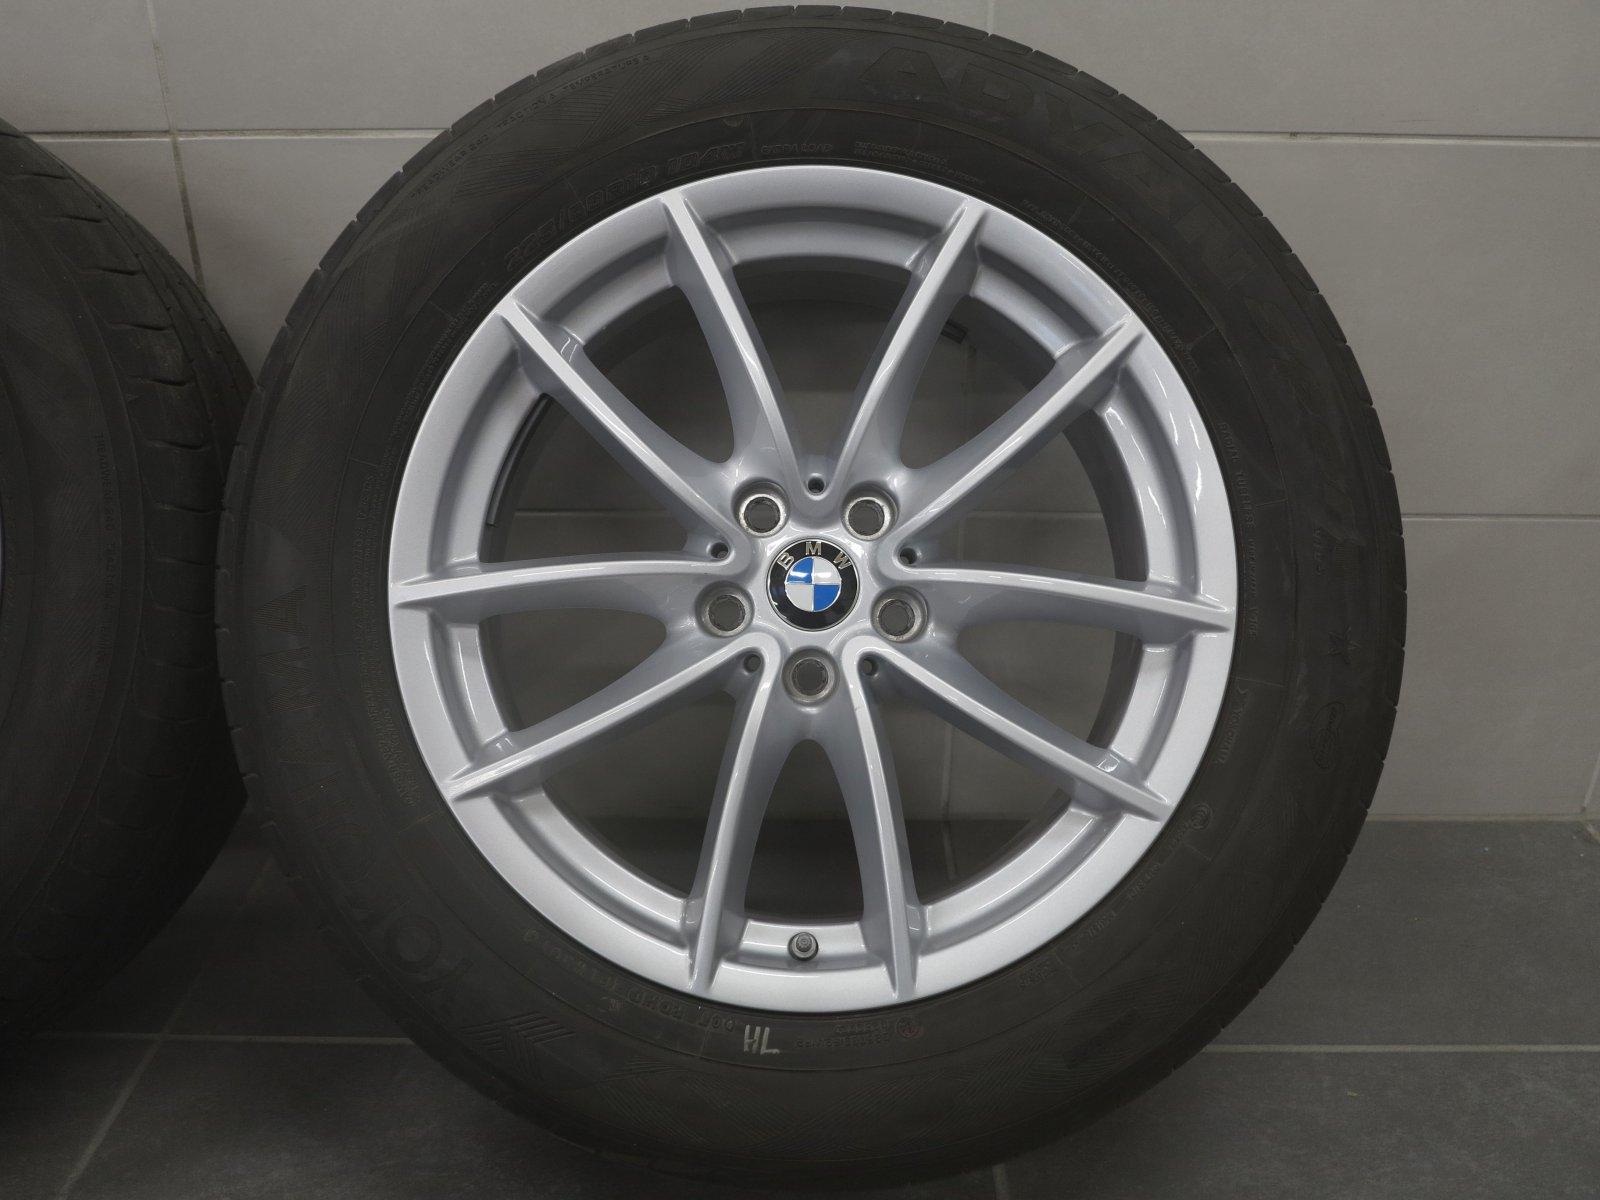 Gorecki 2211187/Set of Wheel Trims VR Carbon 14/Inch